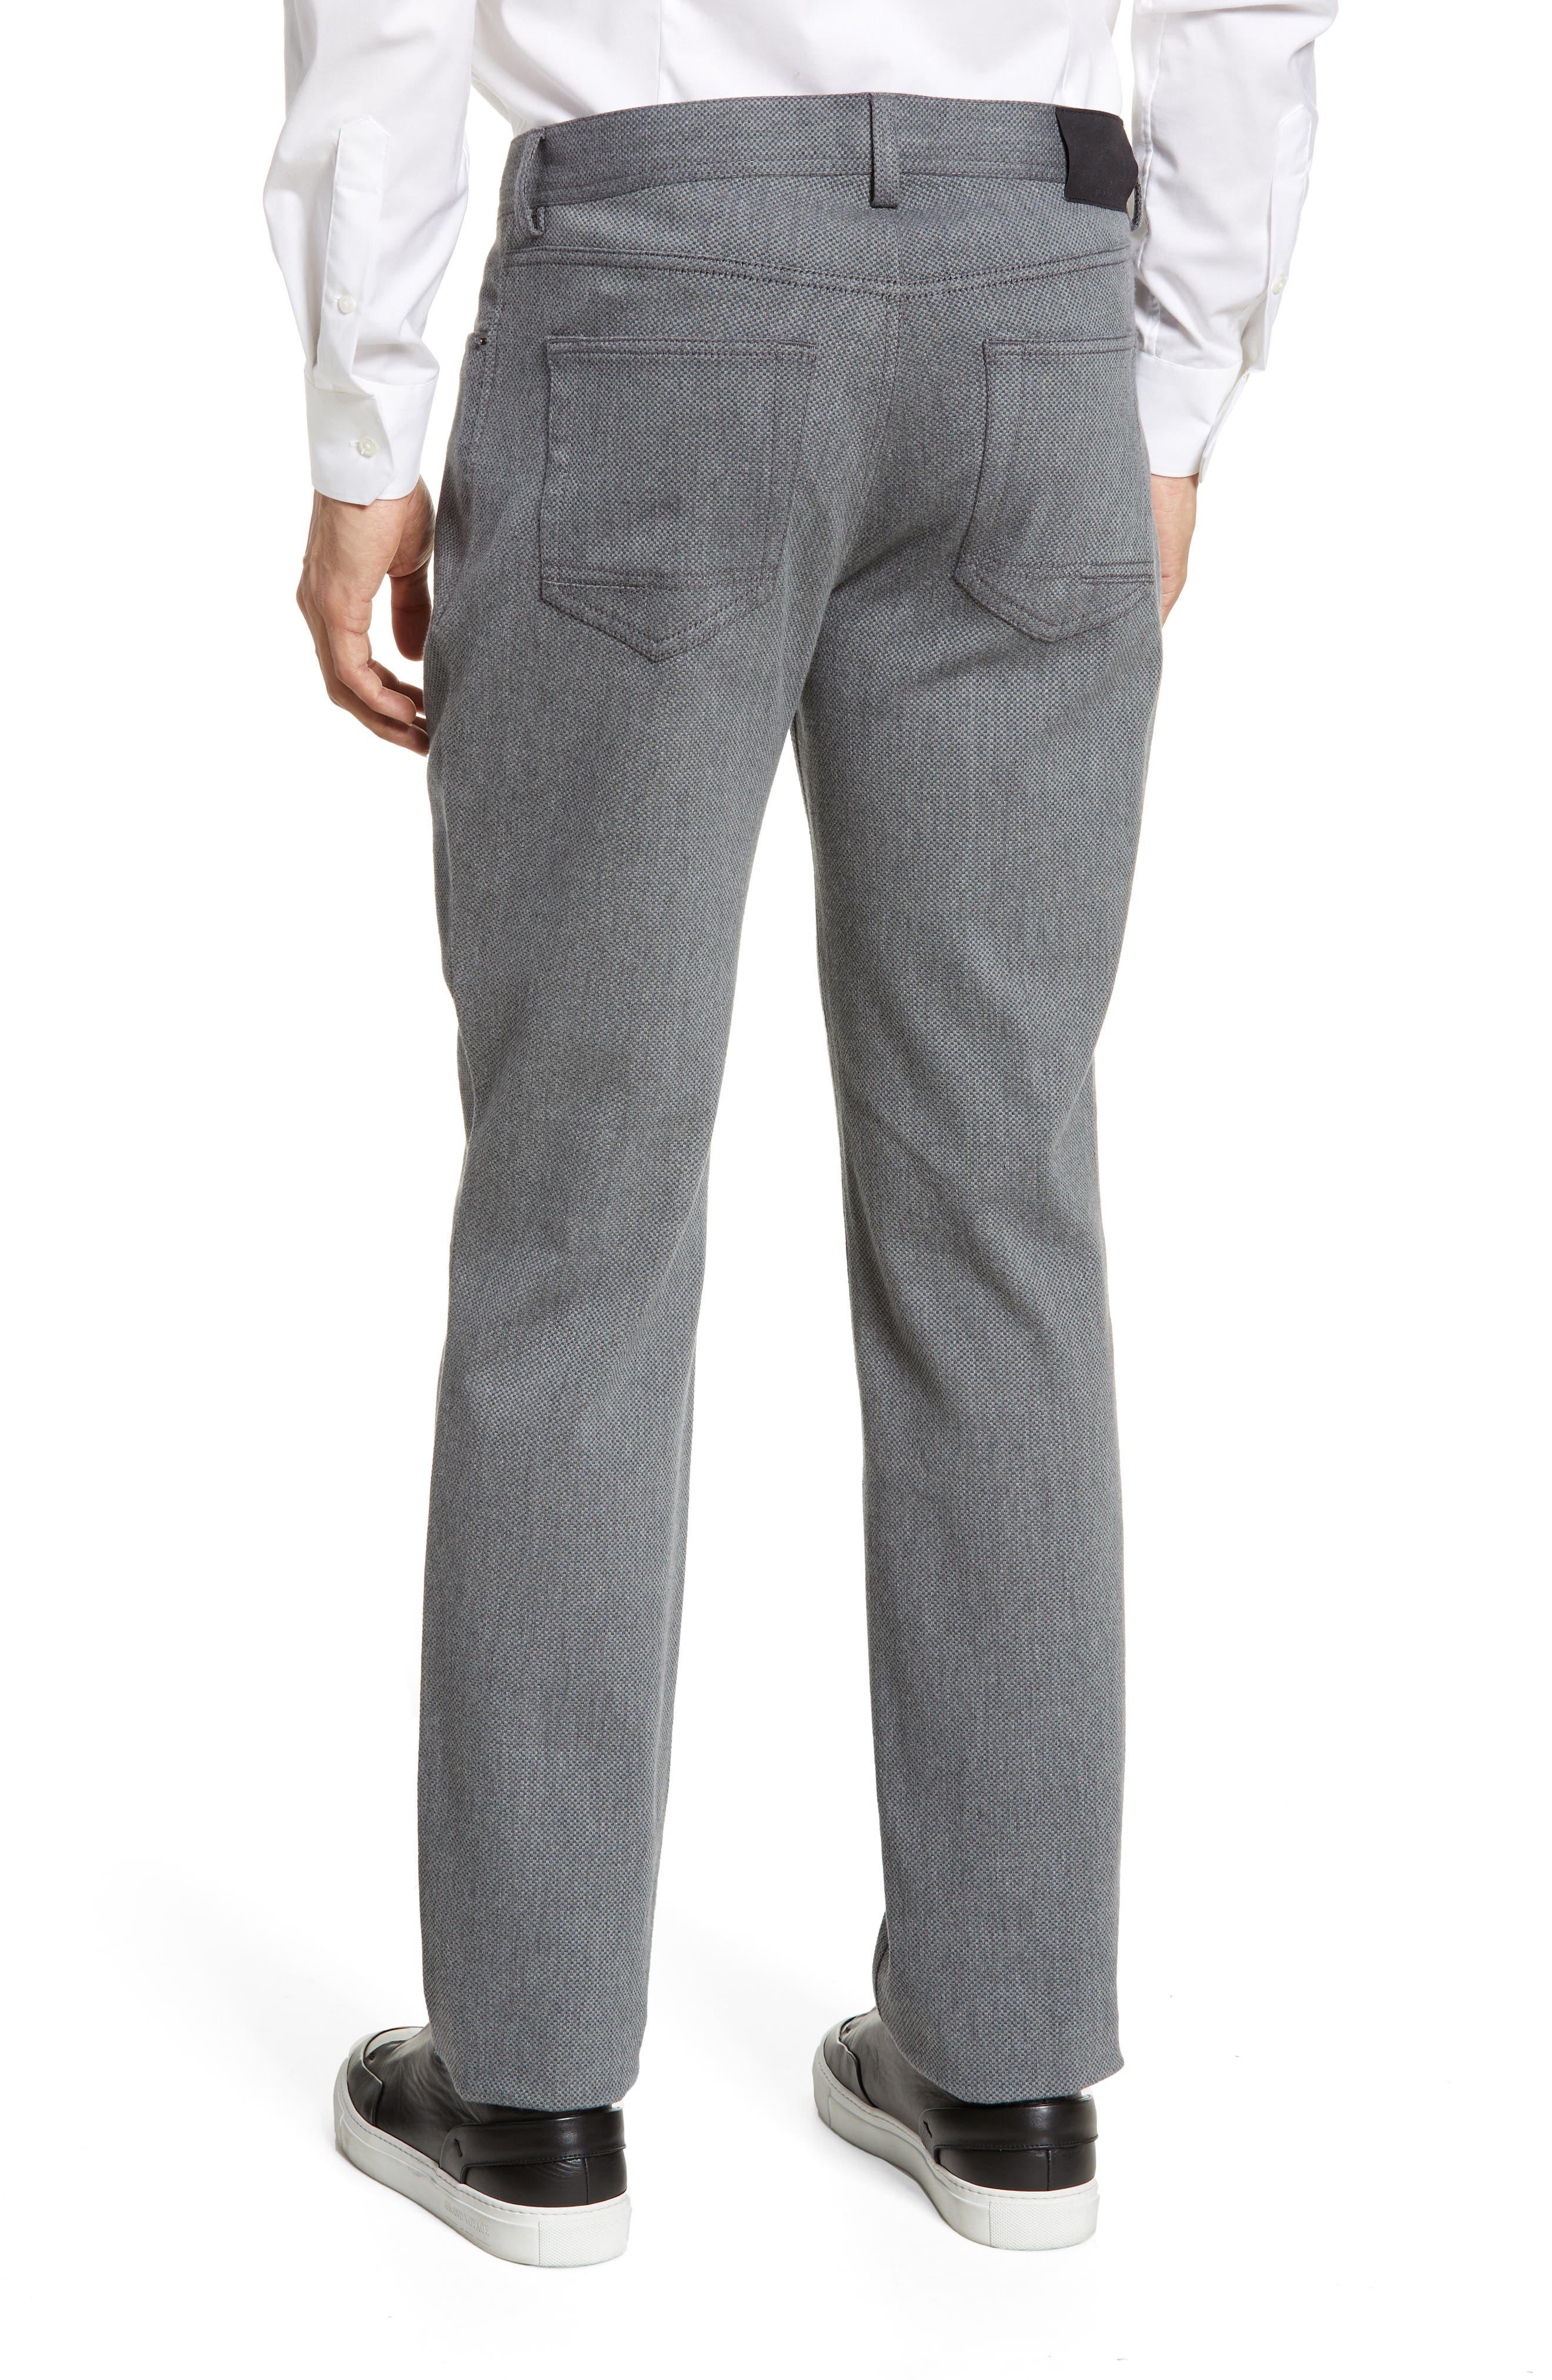 VINCE CAMUTO, Straight Leg Five Pocket Stretch Pants, Alternate thumbnail 2, color, HEATHER CHARCOAL CROSSHATCH